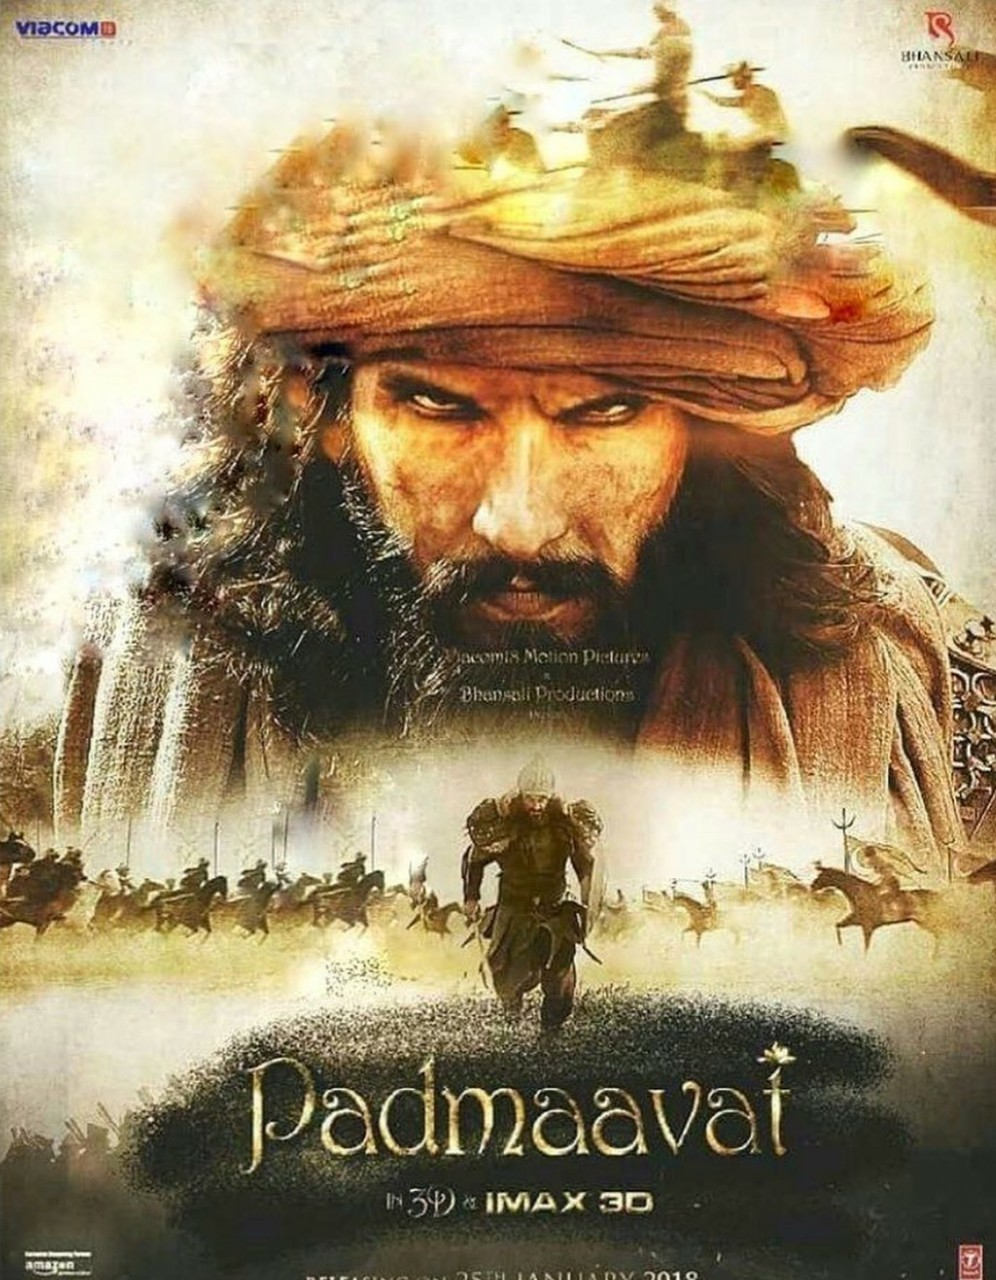 bollywood, padmaavat, and cinema image